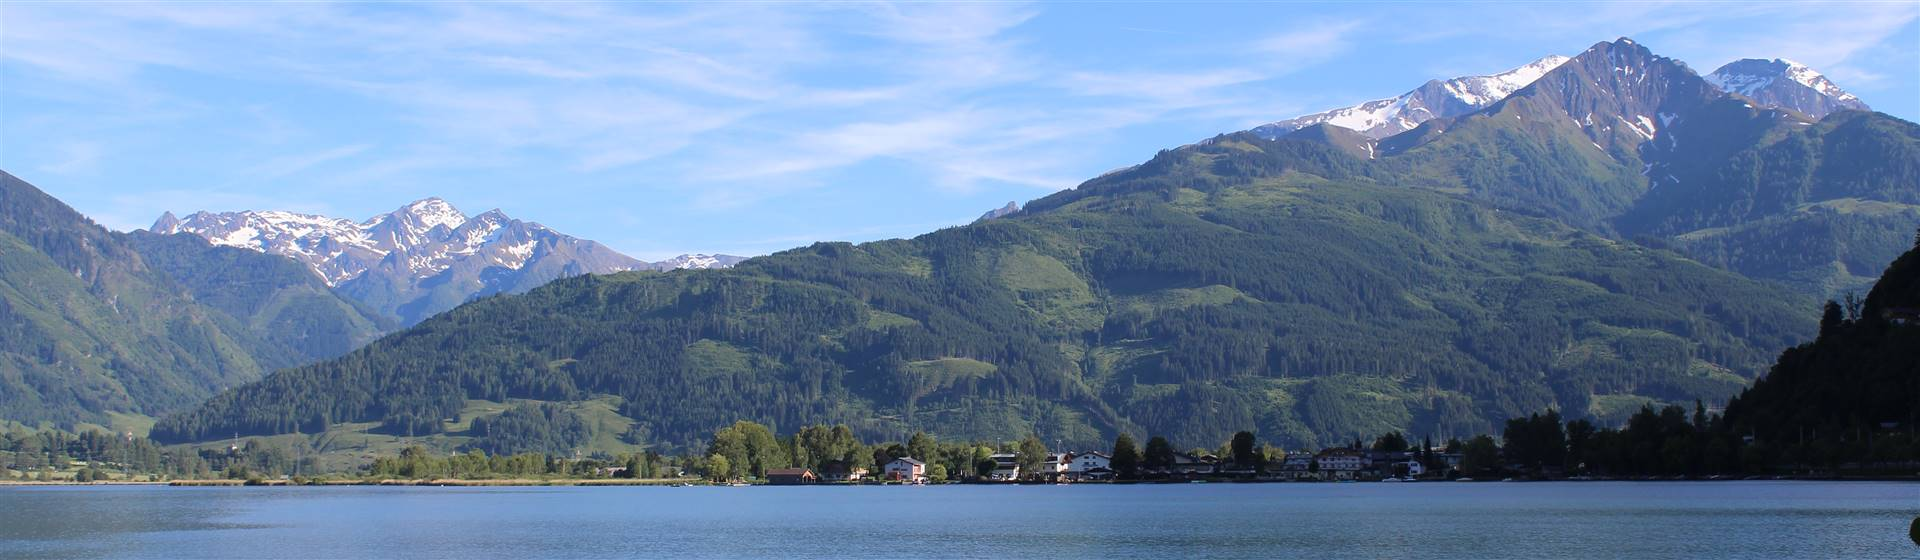 Highlights of Austria - Lakes, Falls Mountain Pass